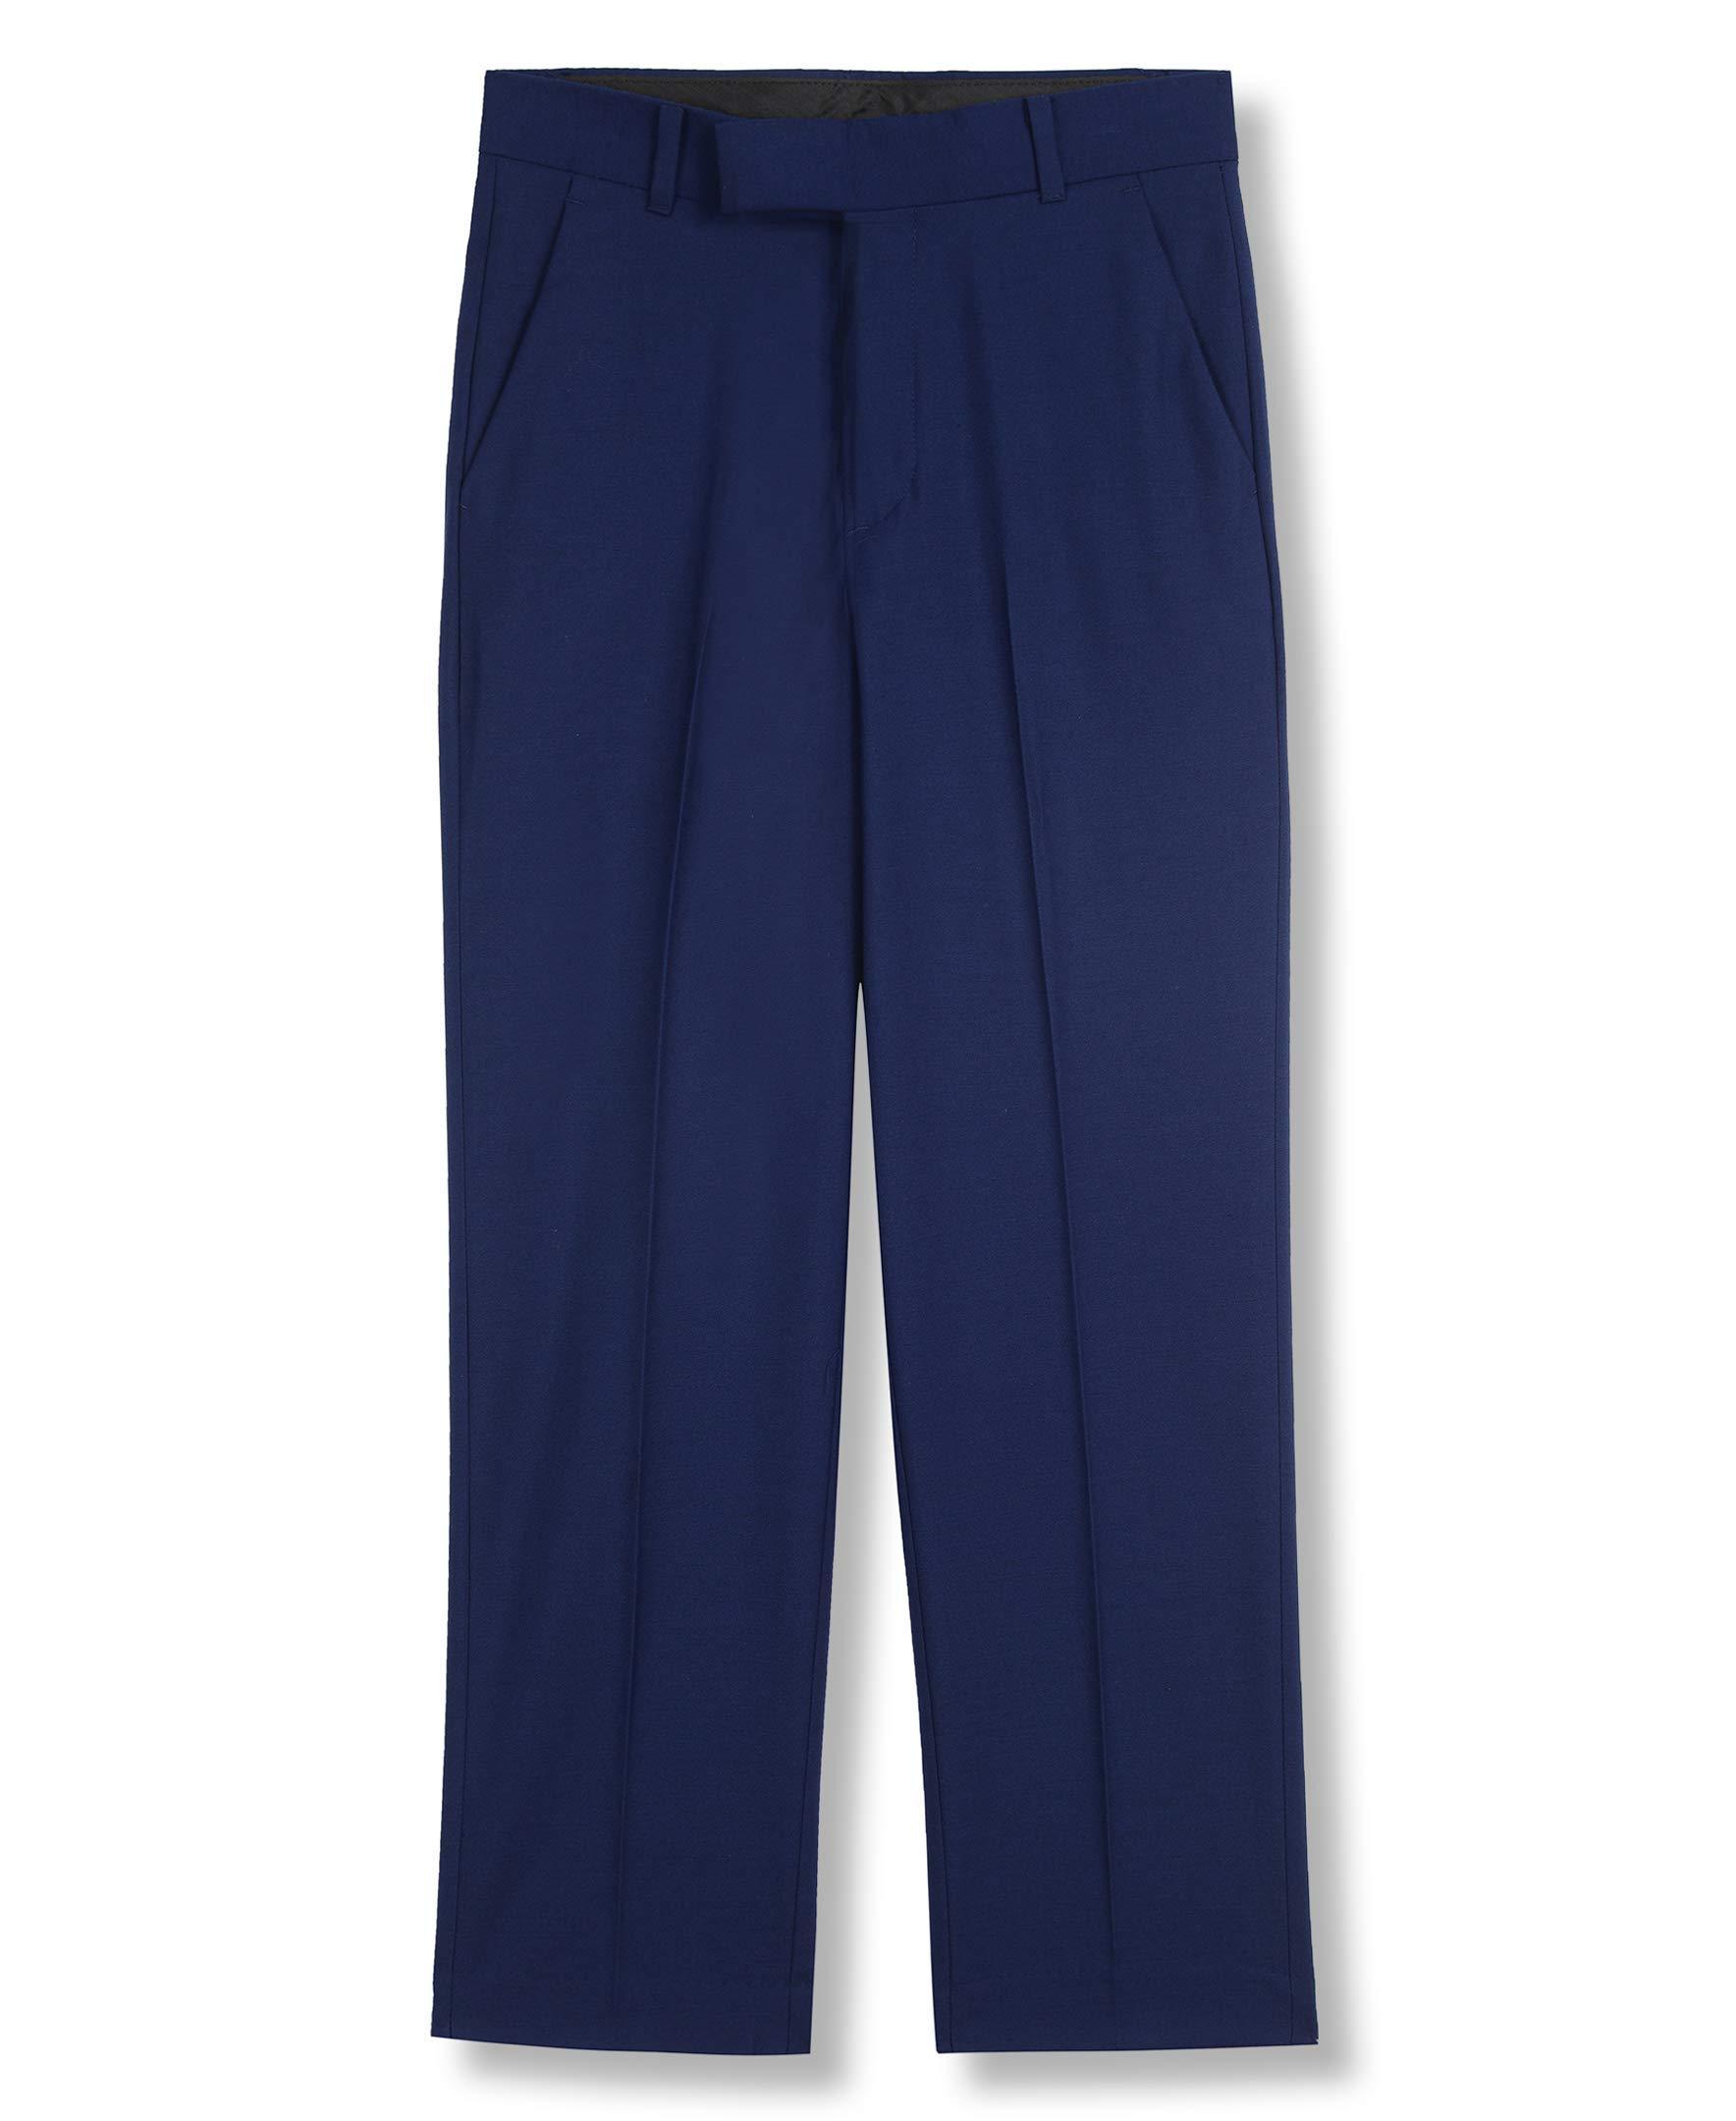 Calvin Klein Big Boys' Flat Front Dress Pant, Infinite Blue, 10 by Calvin Klein (Image #1)